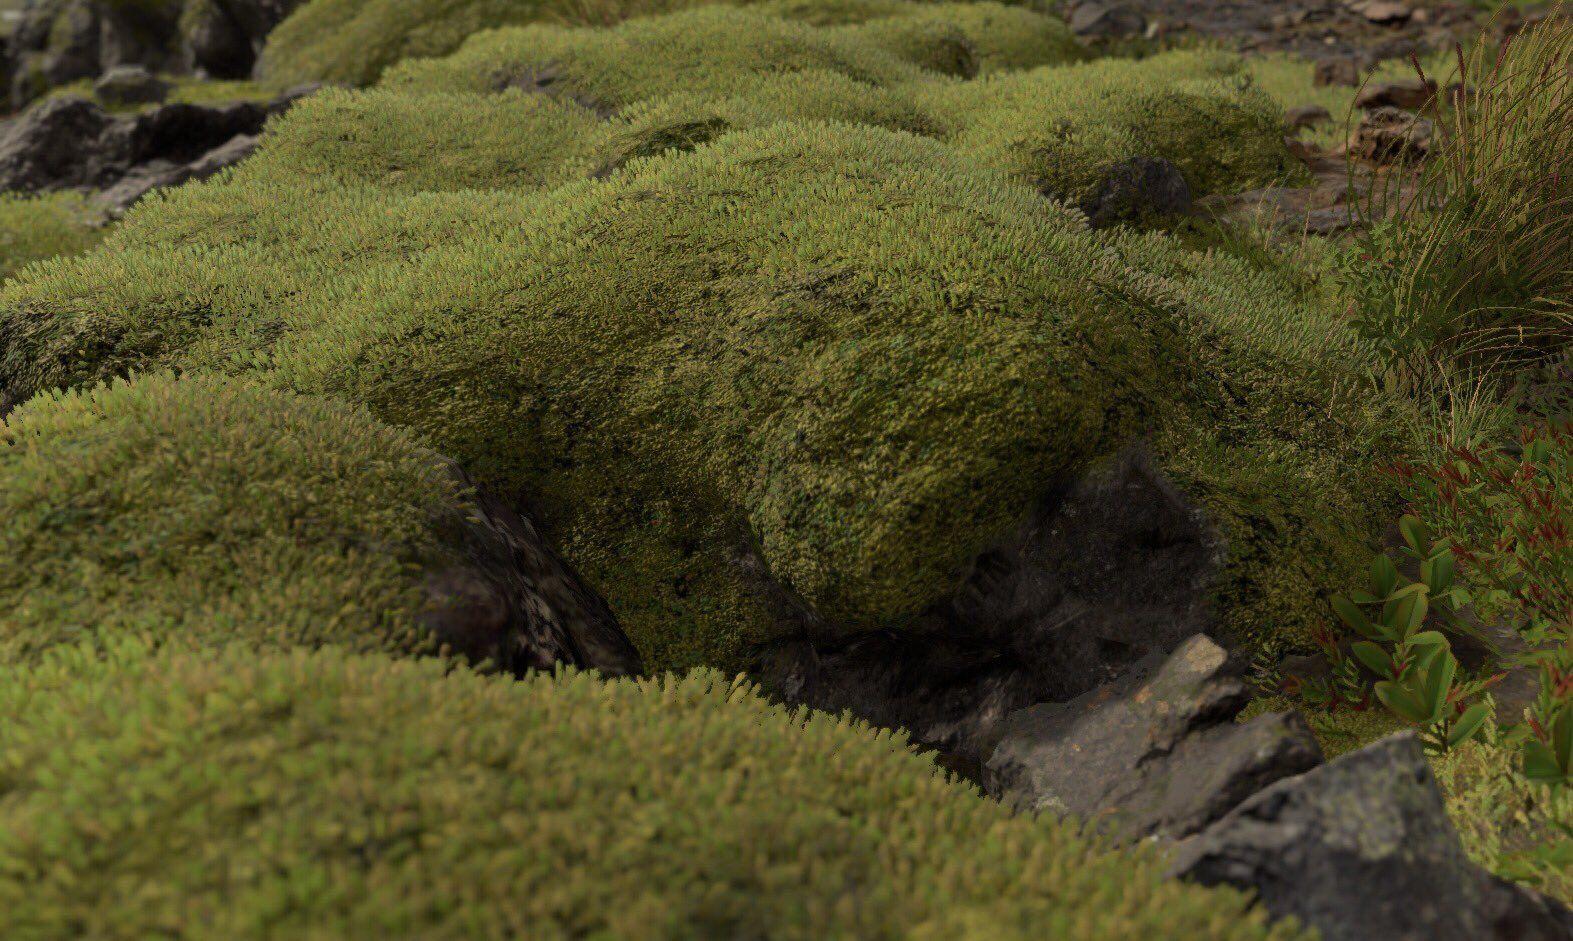 /home/gameworl/public_html/media/kunena/attachments/3/death-stranding-moss.jpg